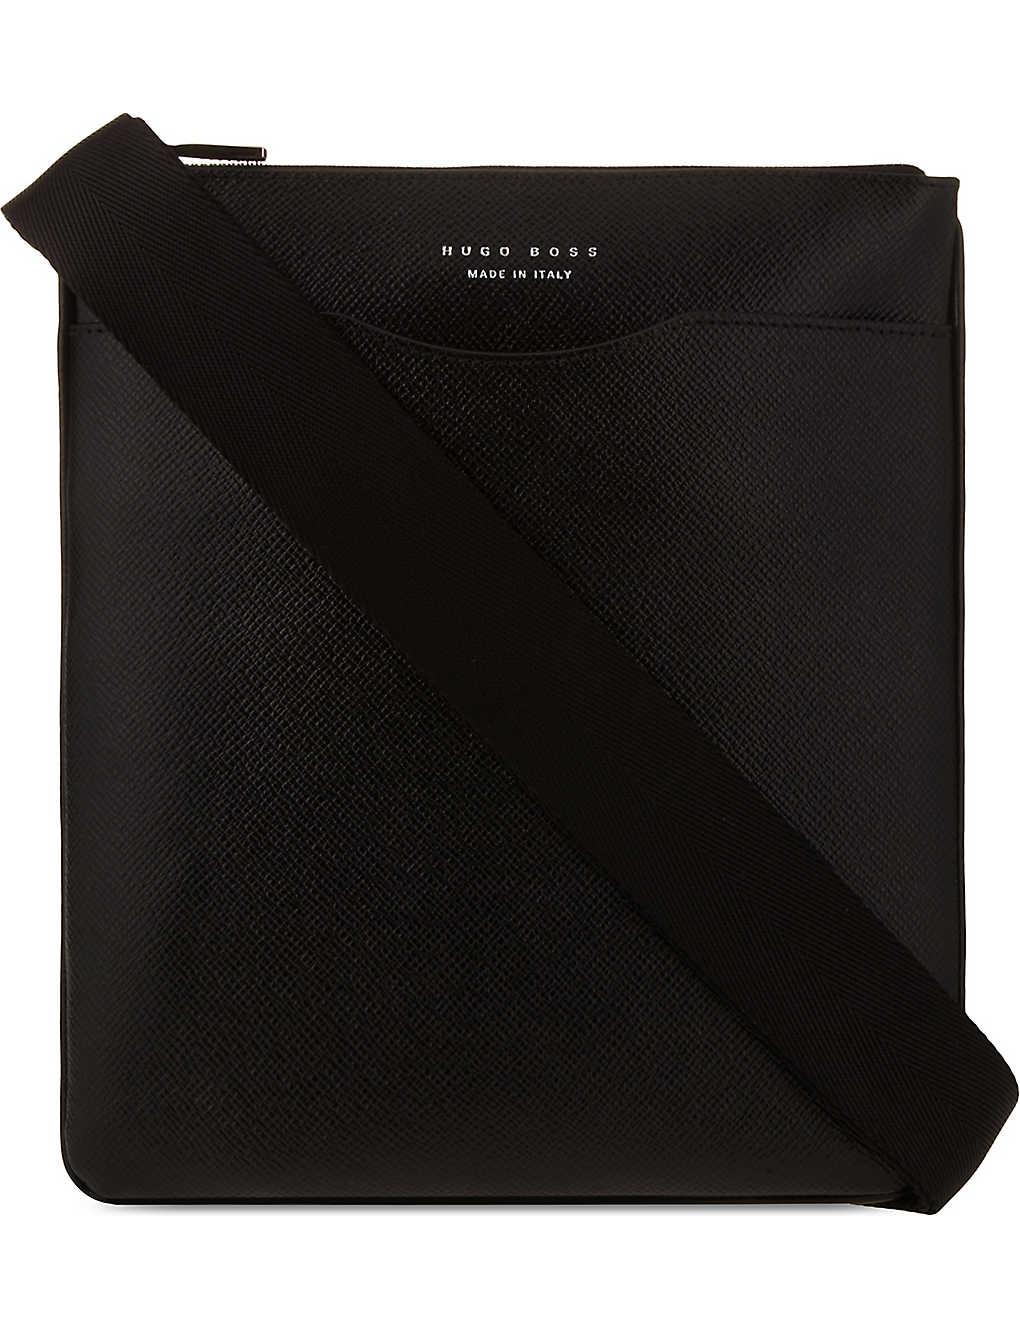 BOSS - Signature leather messenger bag  4963e0ac5556f